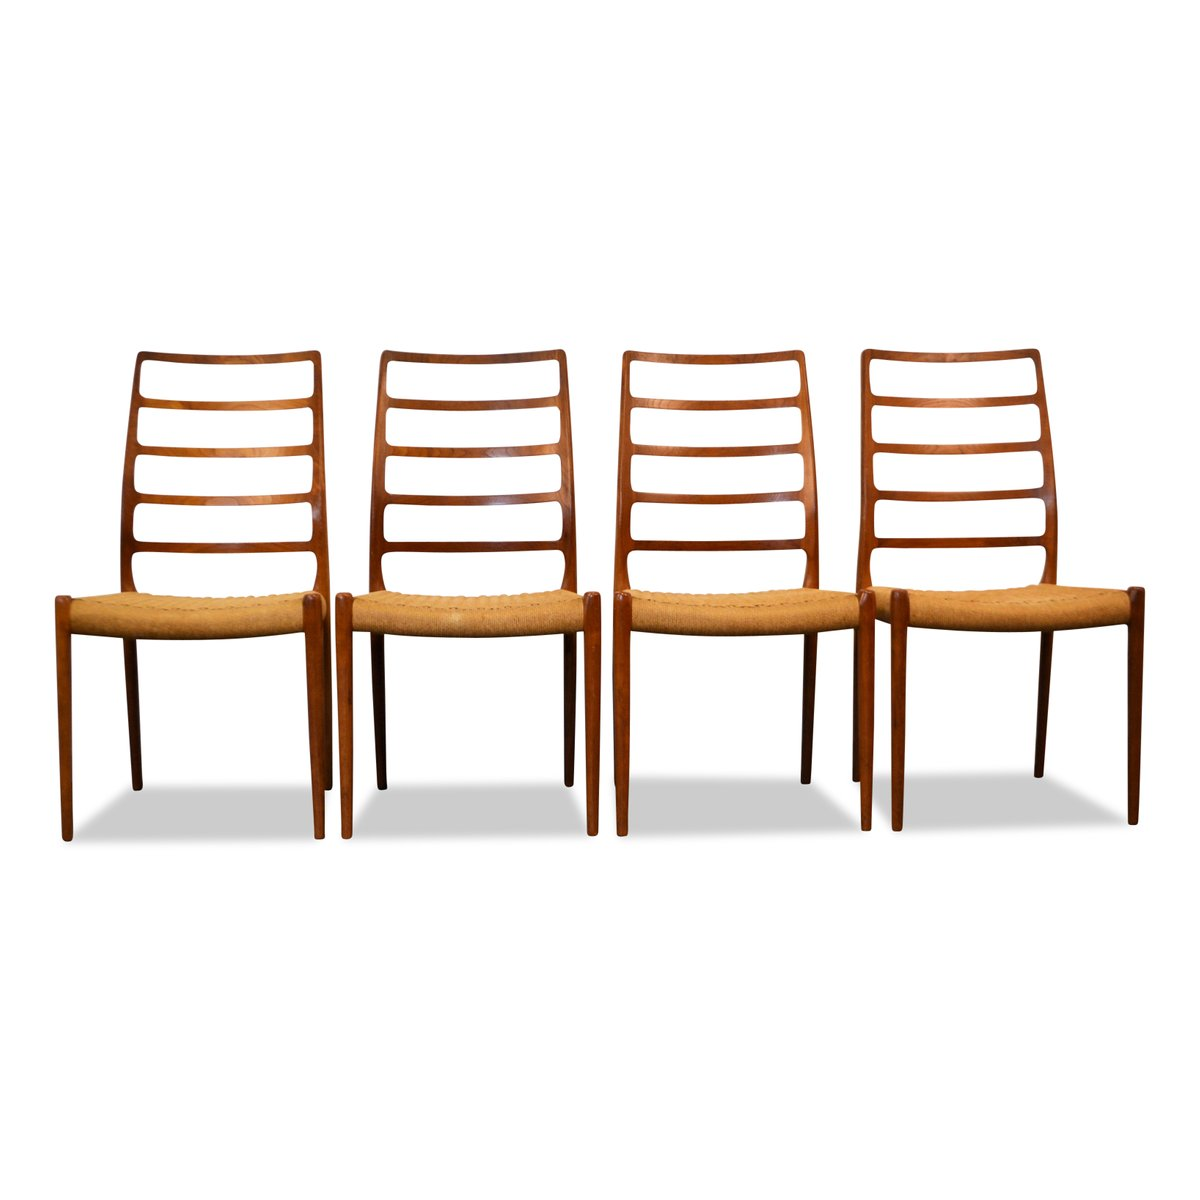 Vintage model teak dining chairs by niels o møller for